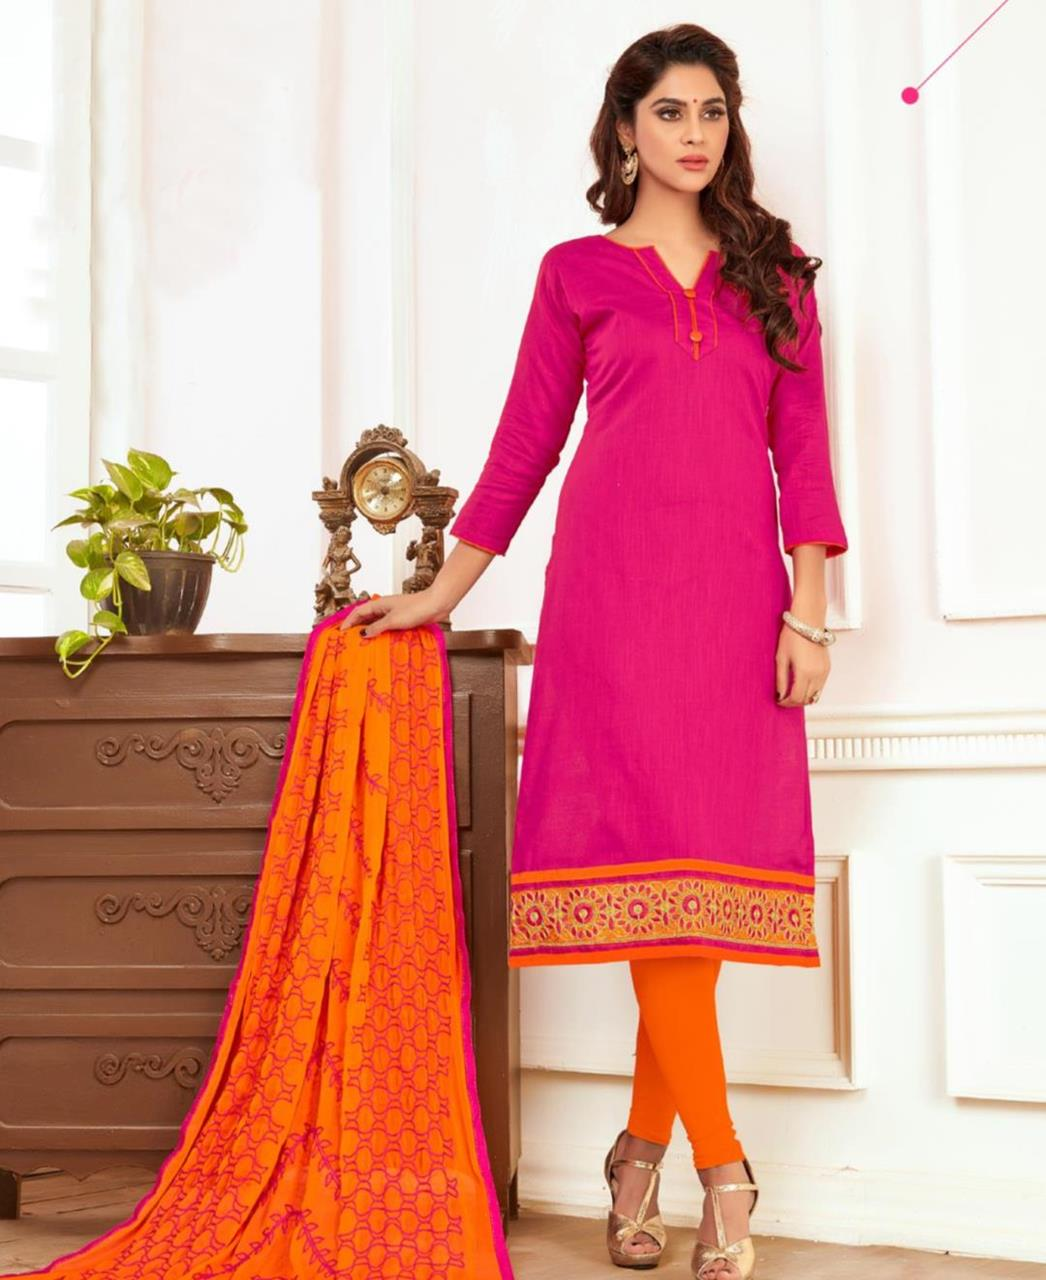 Embroidered Cotton Pink Straight Cut Salwar Kameez